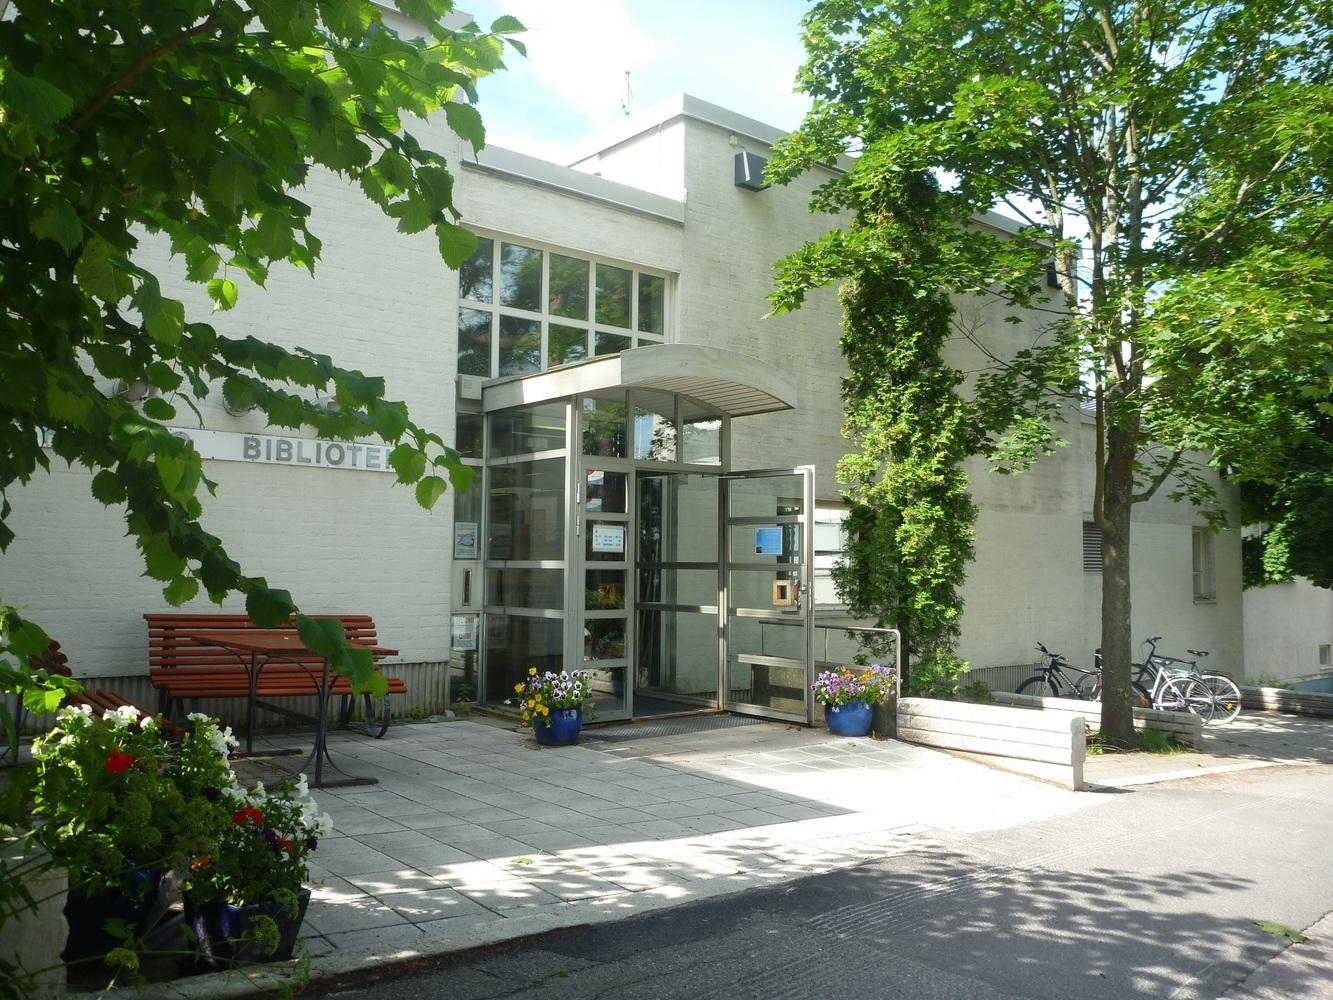 Munksnäs bibliotek